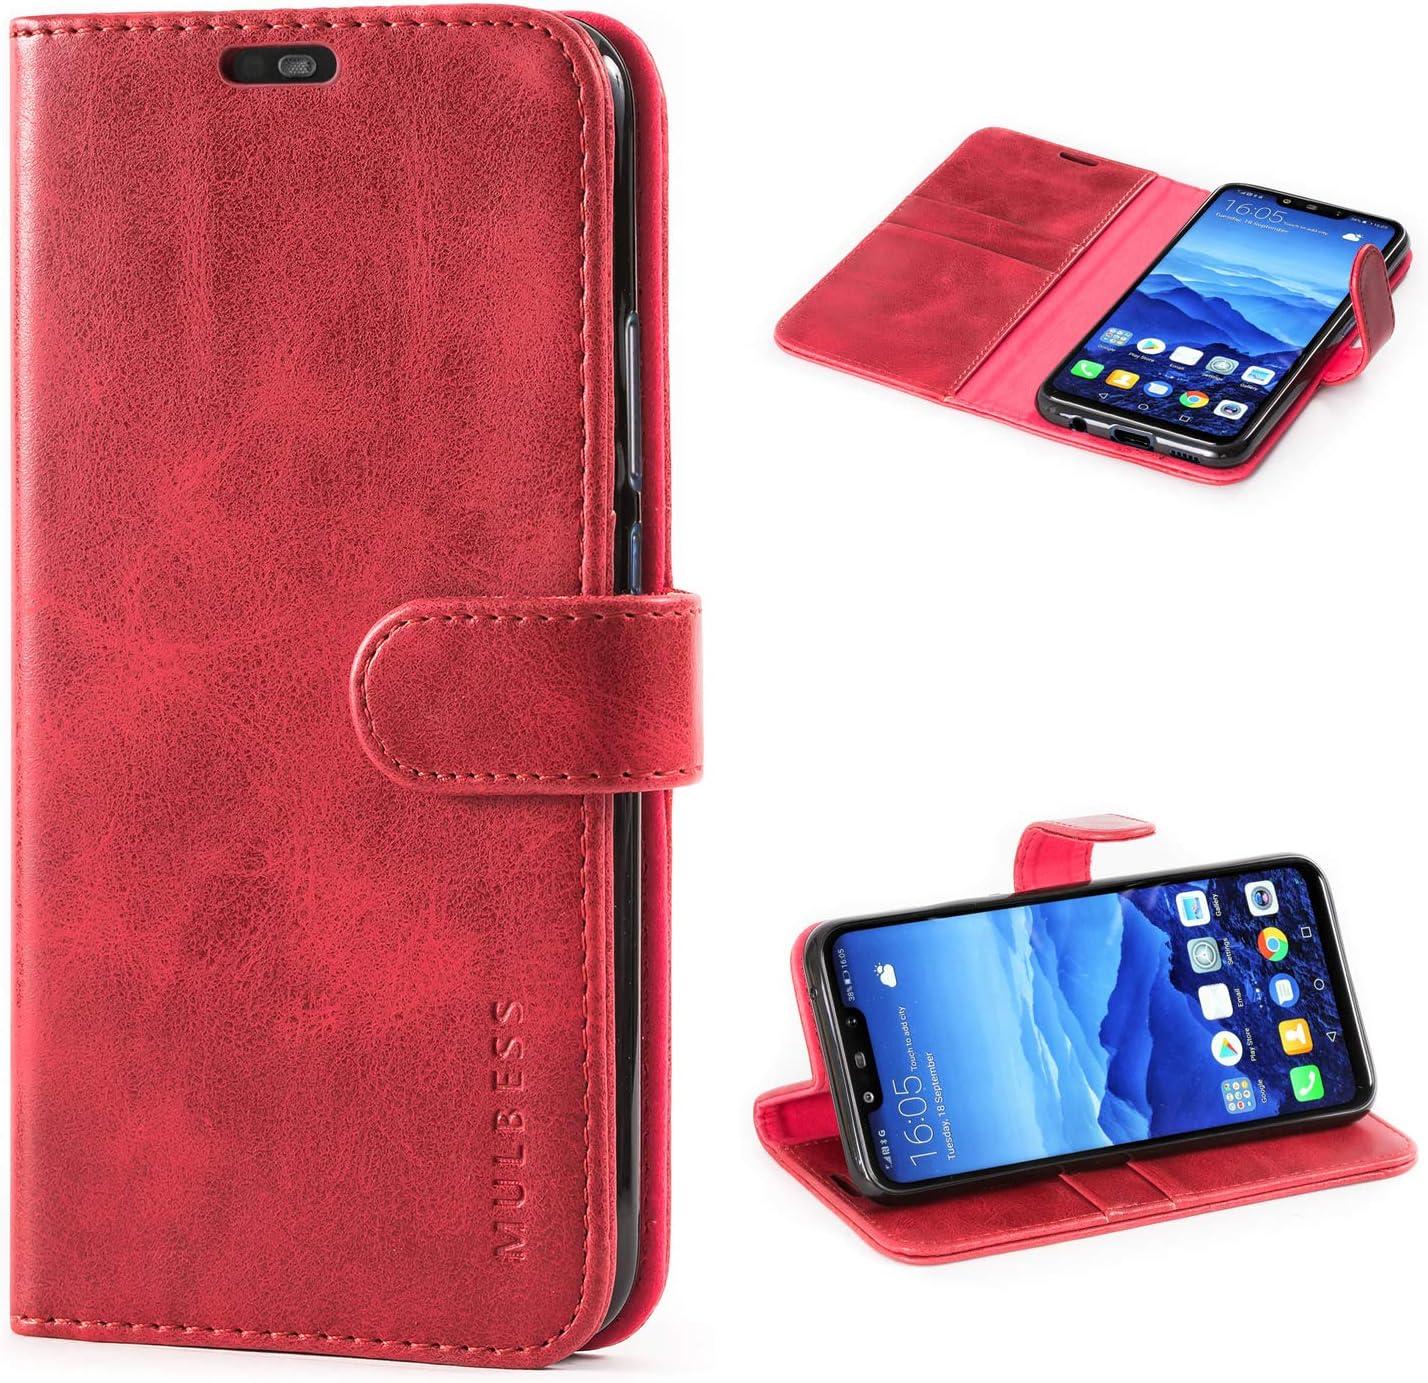 Modisch Schwarz Huawei Mate20 Lite Klapph/ülle Handytasche Case f/ür Huawei Mate 20 Lite//Huawei Mate20 Lite Handy H/üllen MOBESV Handyh/ülle f/ür Huawei Mate 20 Lite H/ülle Leder